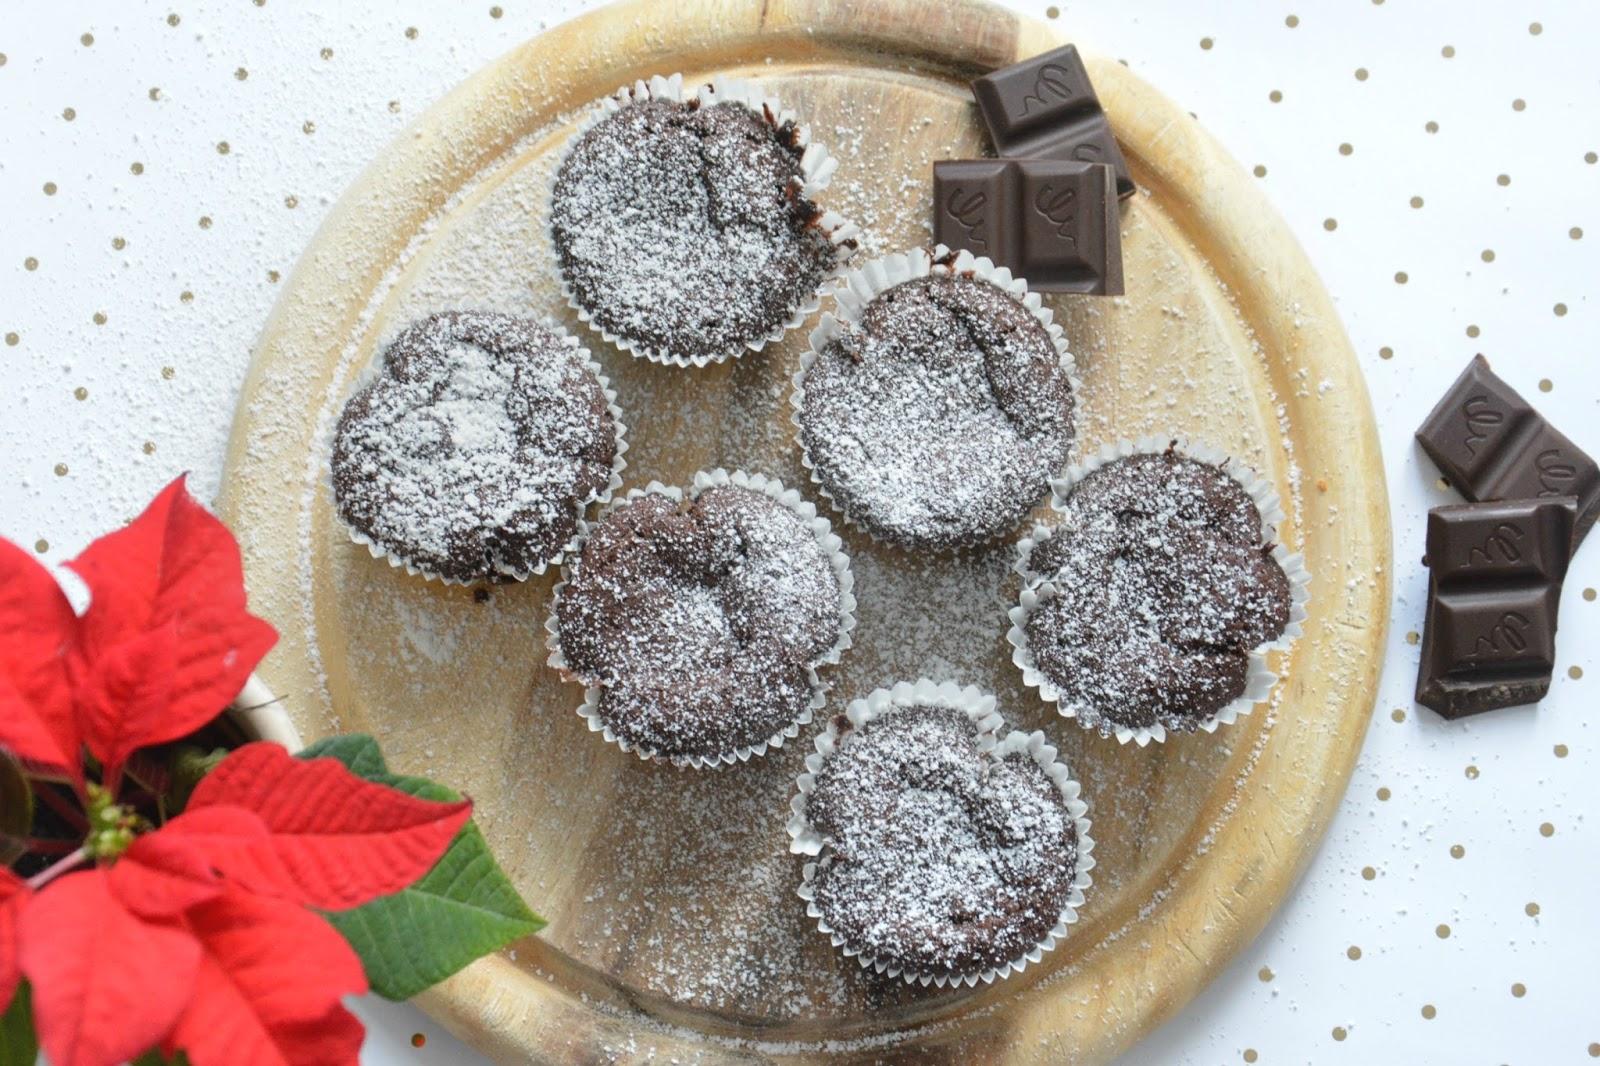 Vegan Chocolate Muffins With Hazelnut Cream Filling on Wood Platter; Christmas Star; Dark Chocolate